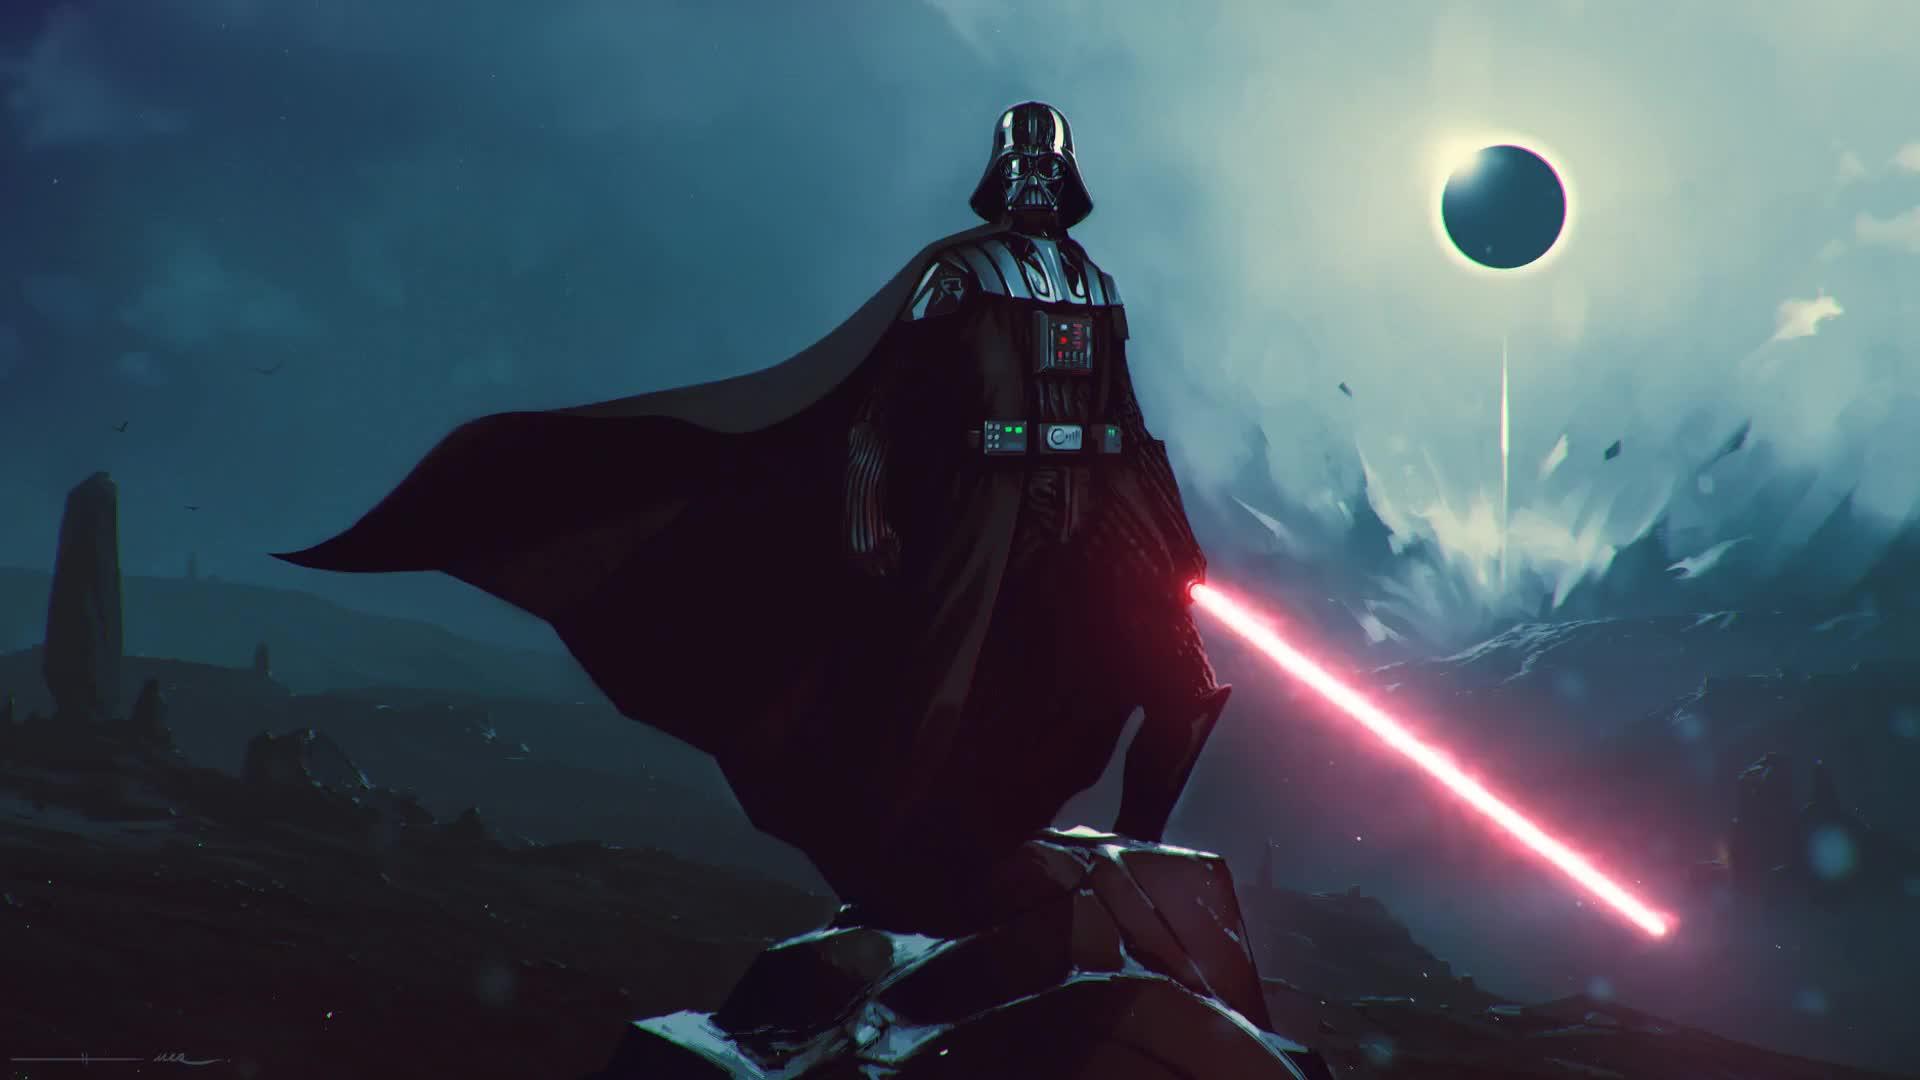 Star Wars Darth Vader Live Wallpaper Gif Gfycat